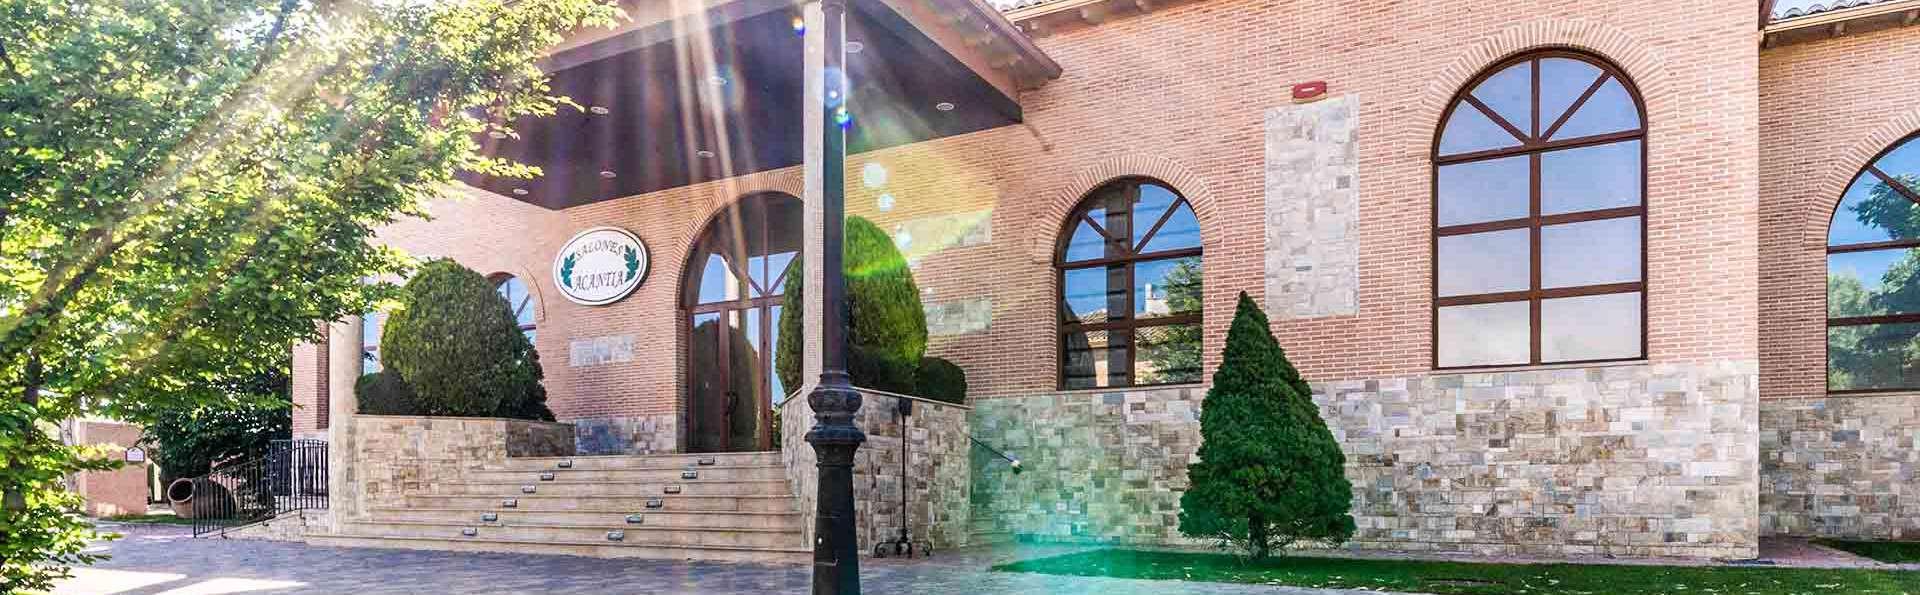 Hotel Comendador - EDIT_EXTERIOR_01.jpg